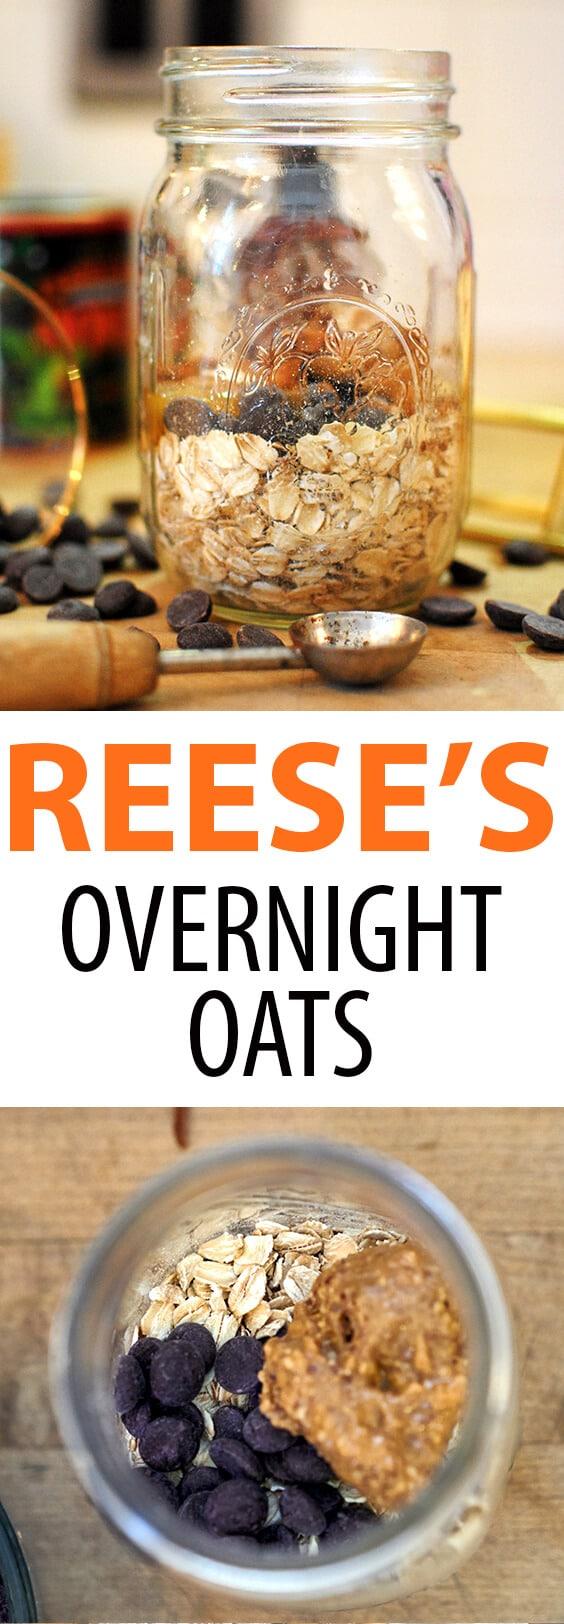 Reese's Peanut Butter Overnight Oats